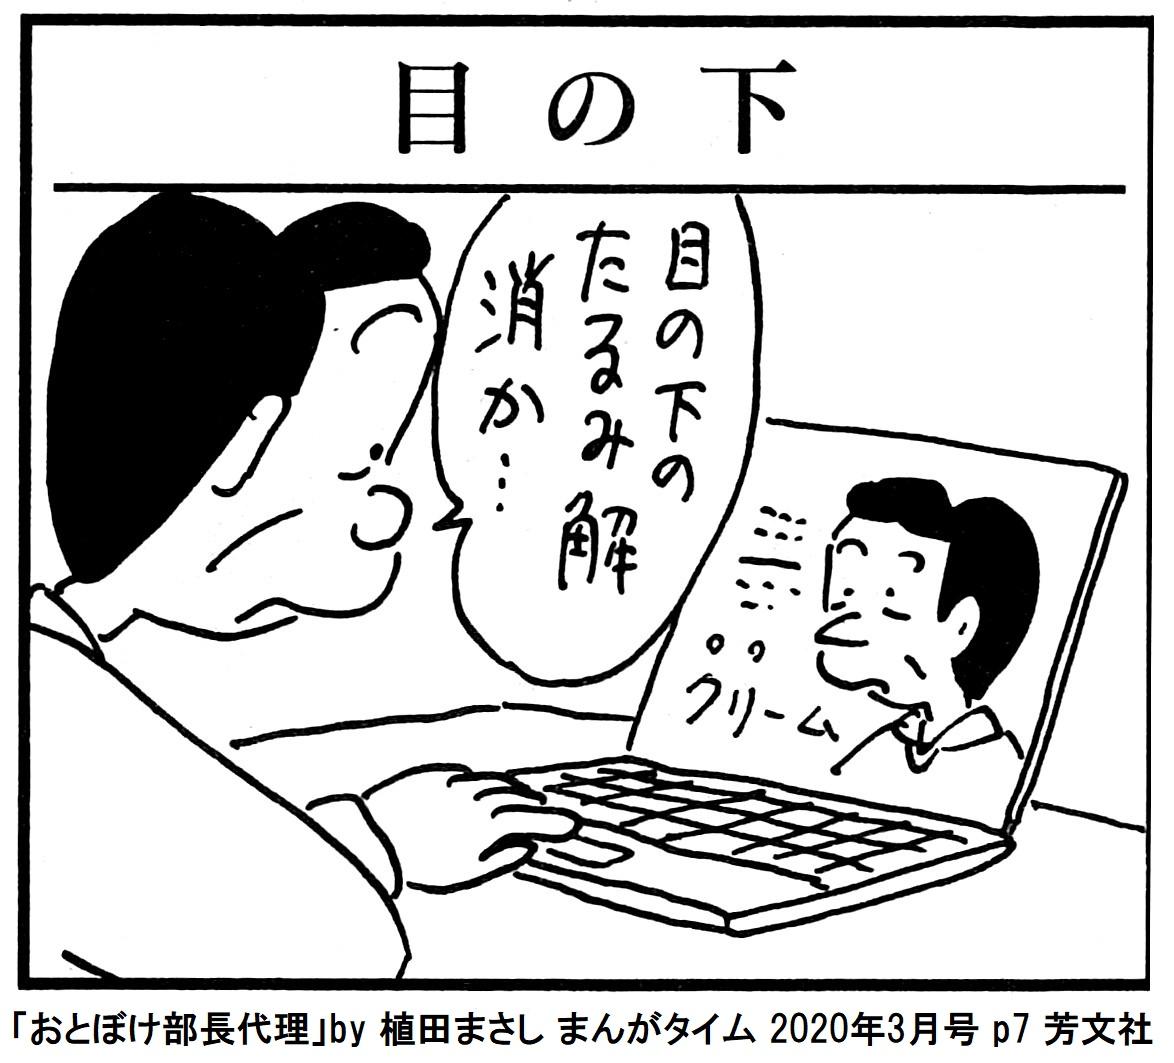 f:id:tanaka-minoru-fake:20200208230511j:plain